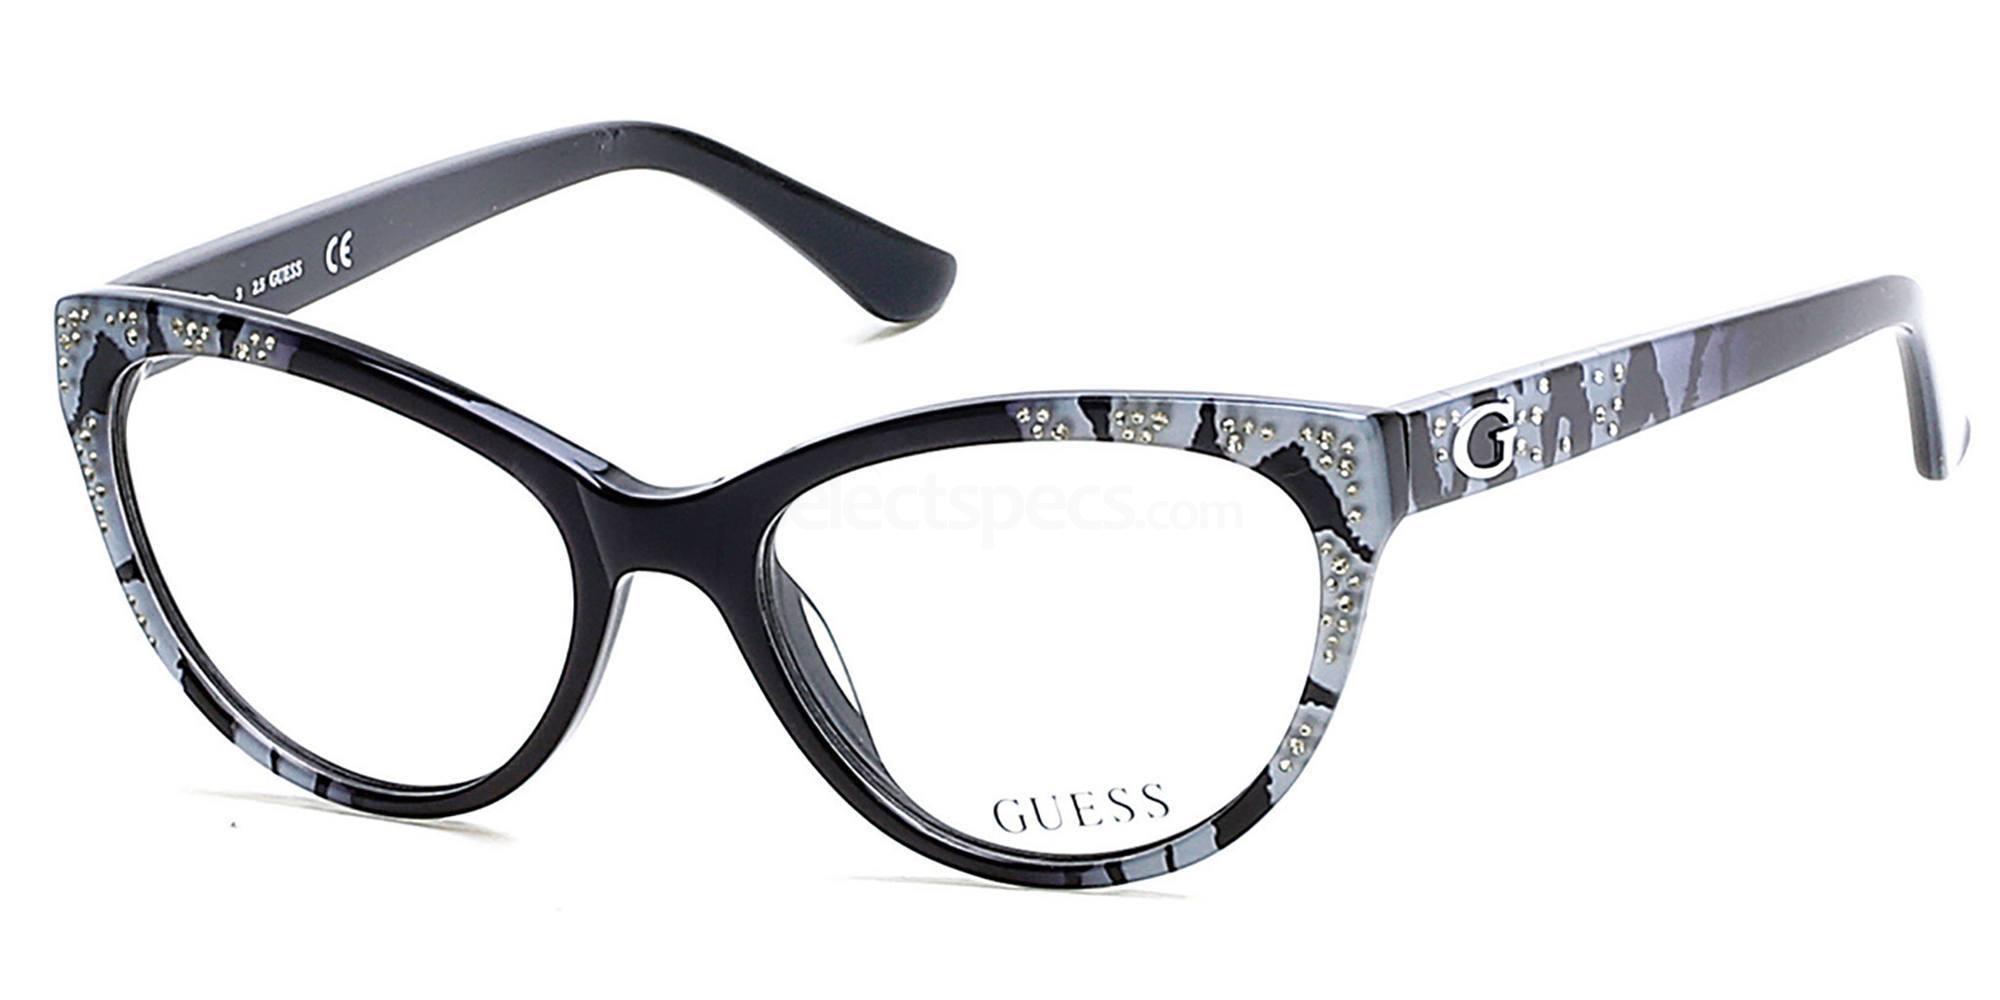 001 GU2554 Glasses, Guess